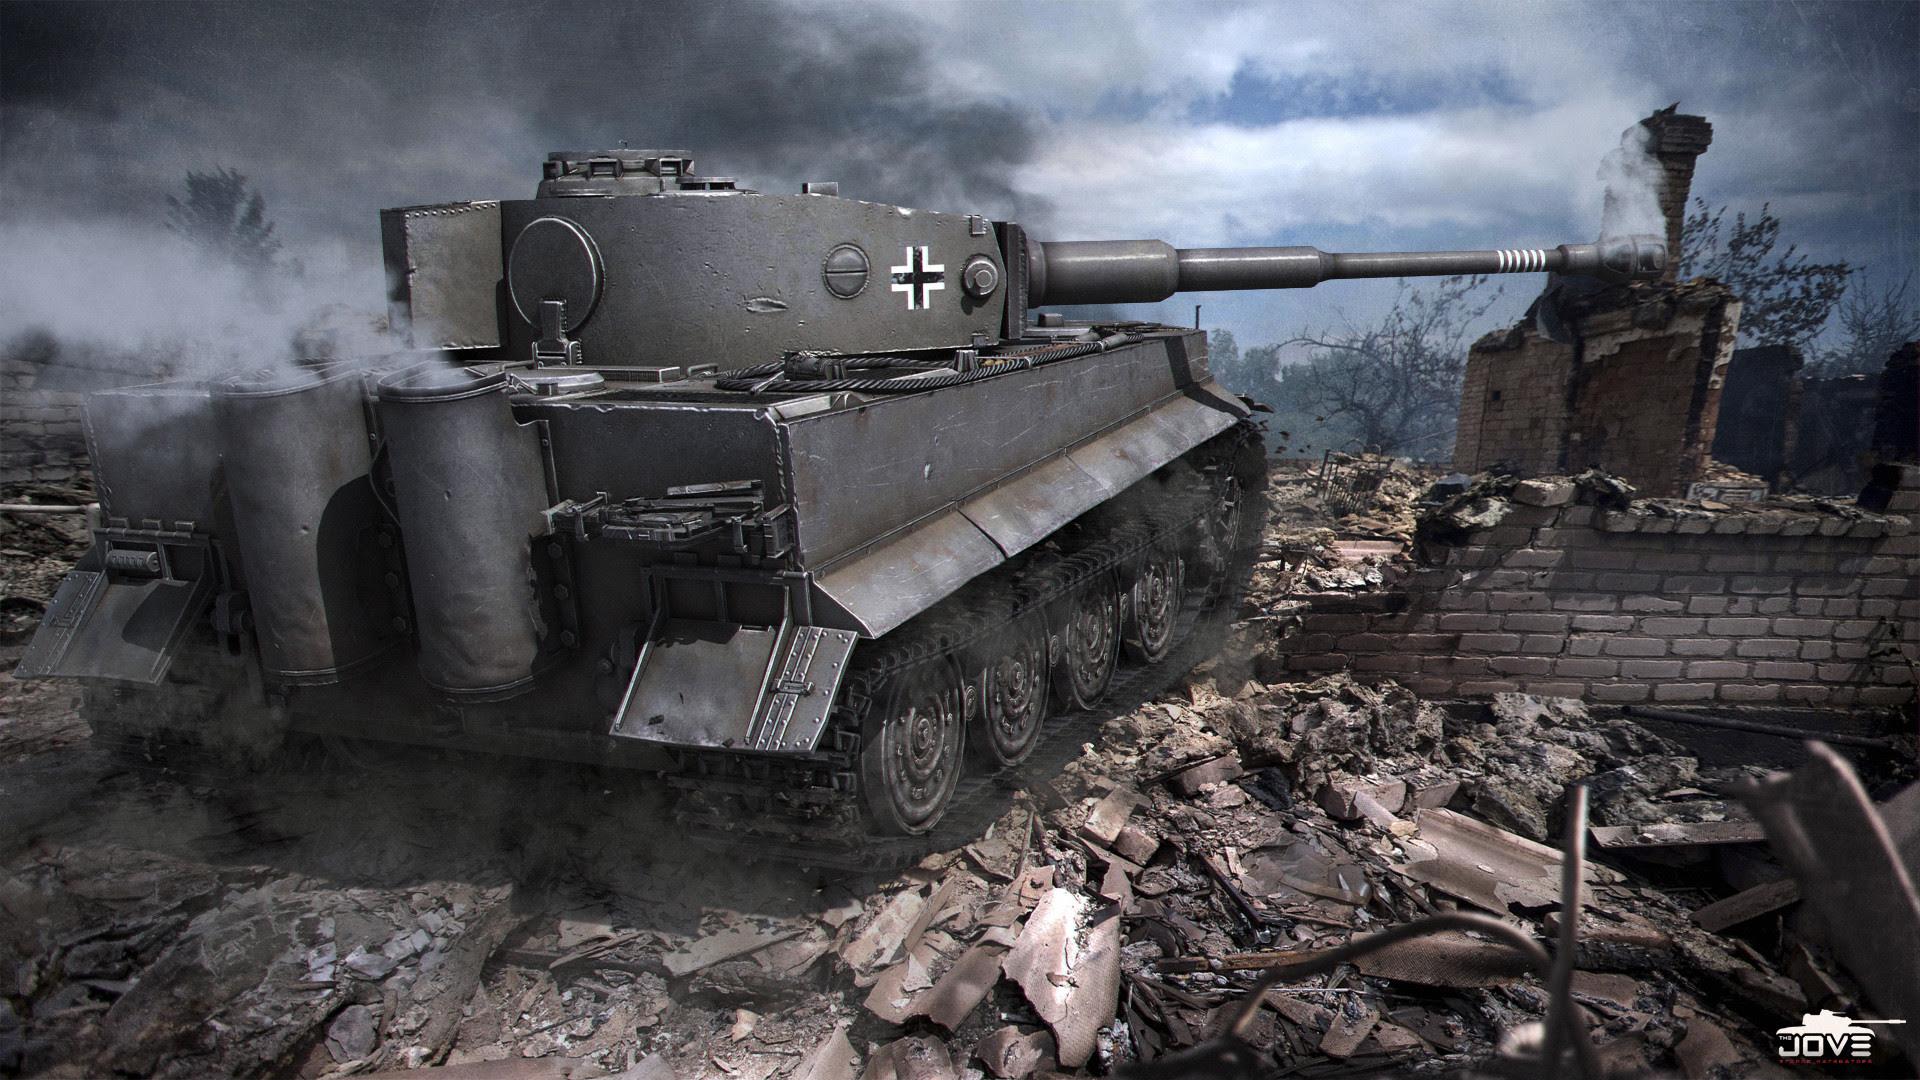 King Tiger Tank Wallpaper 74 Images